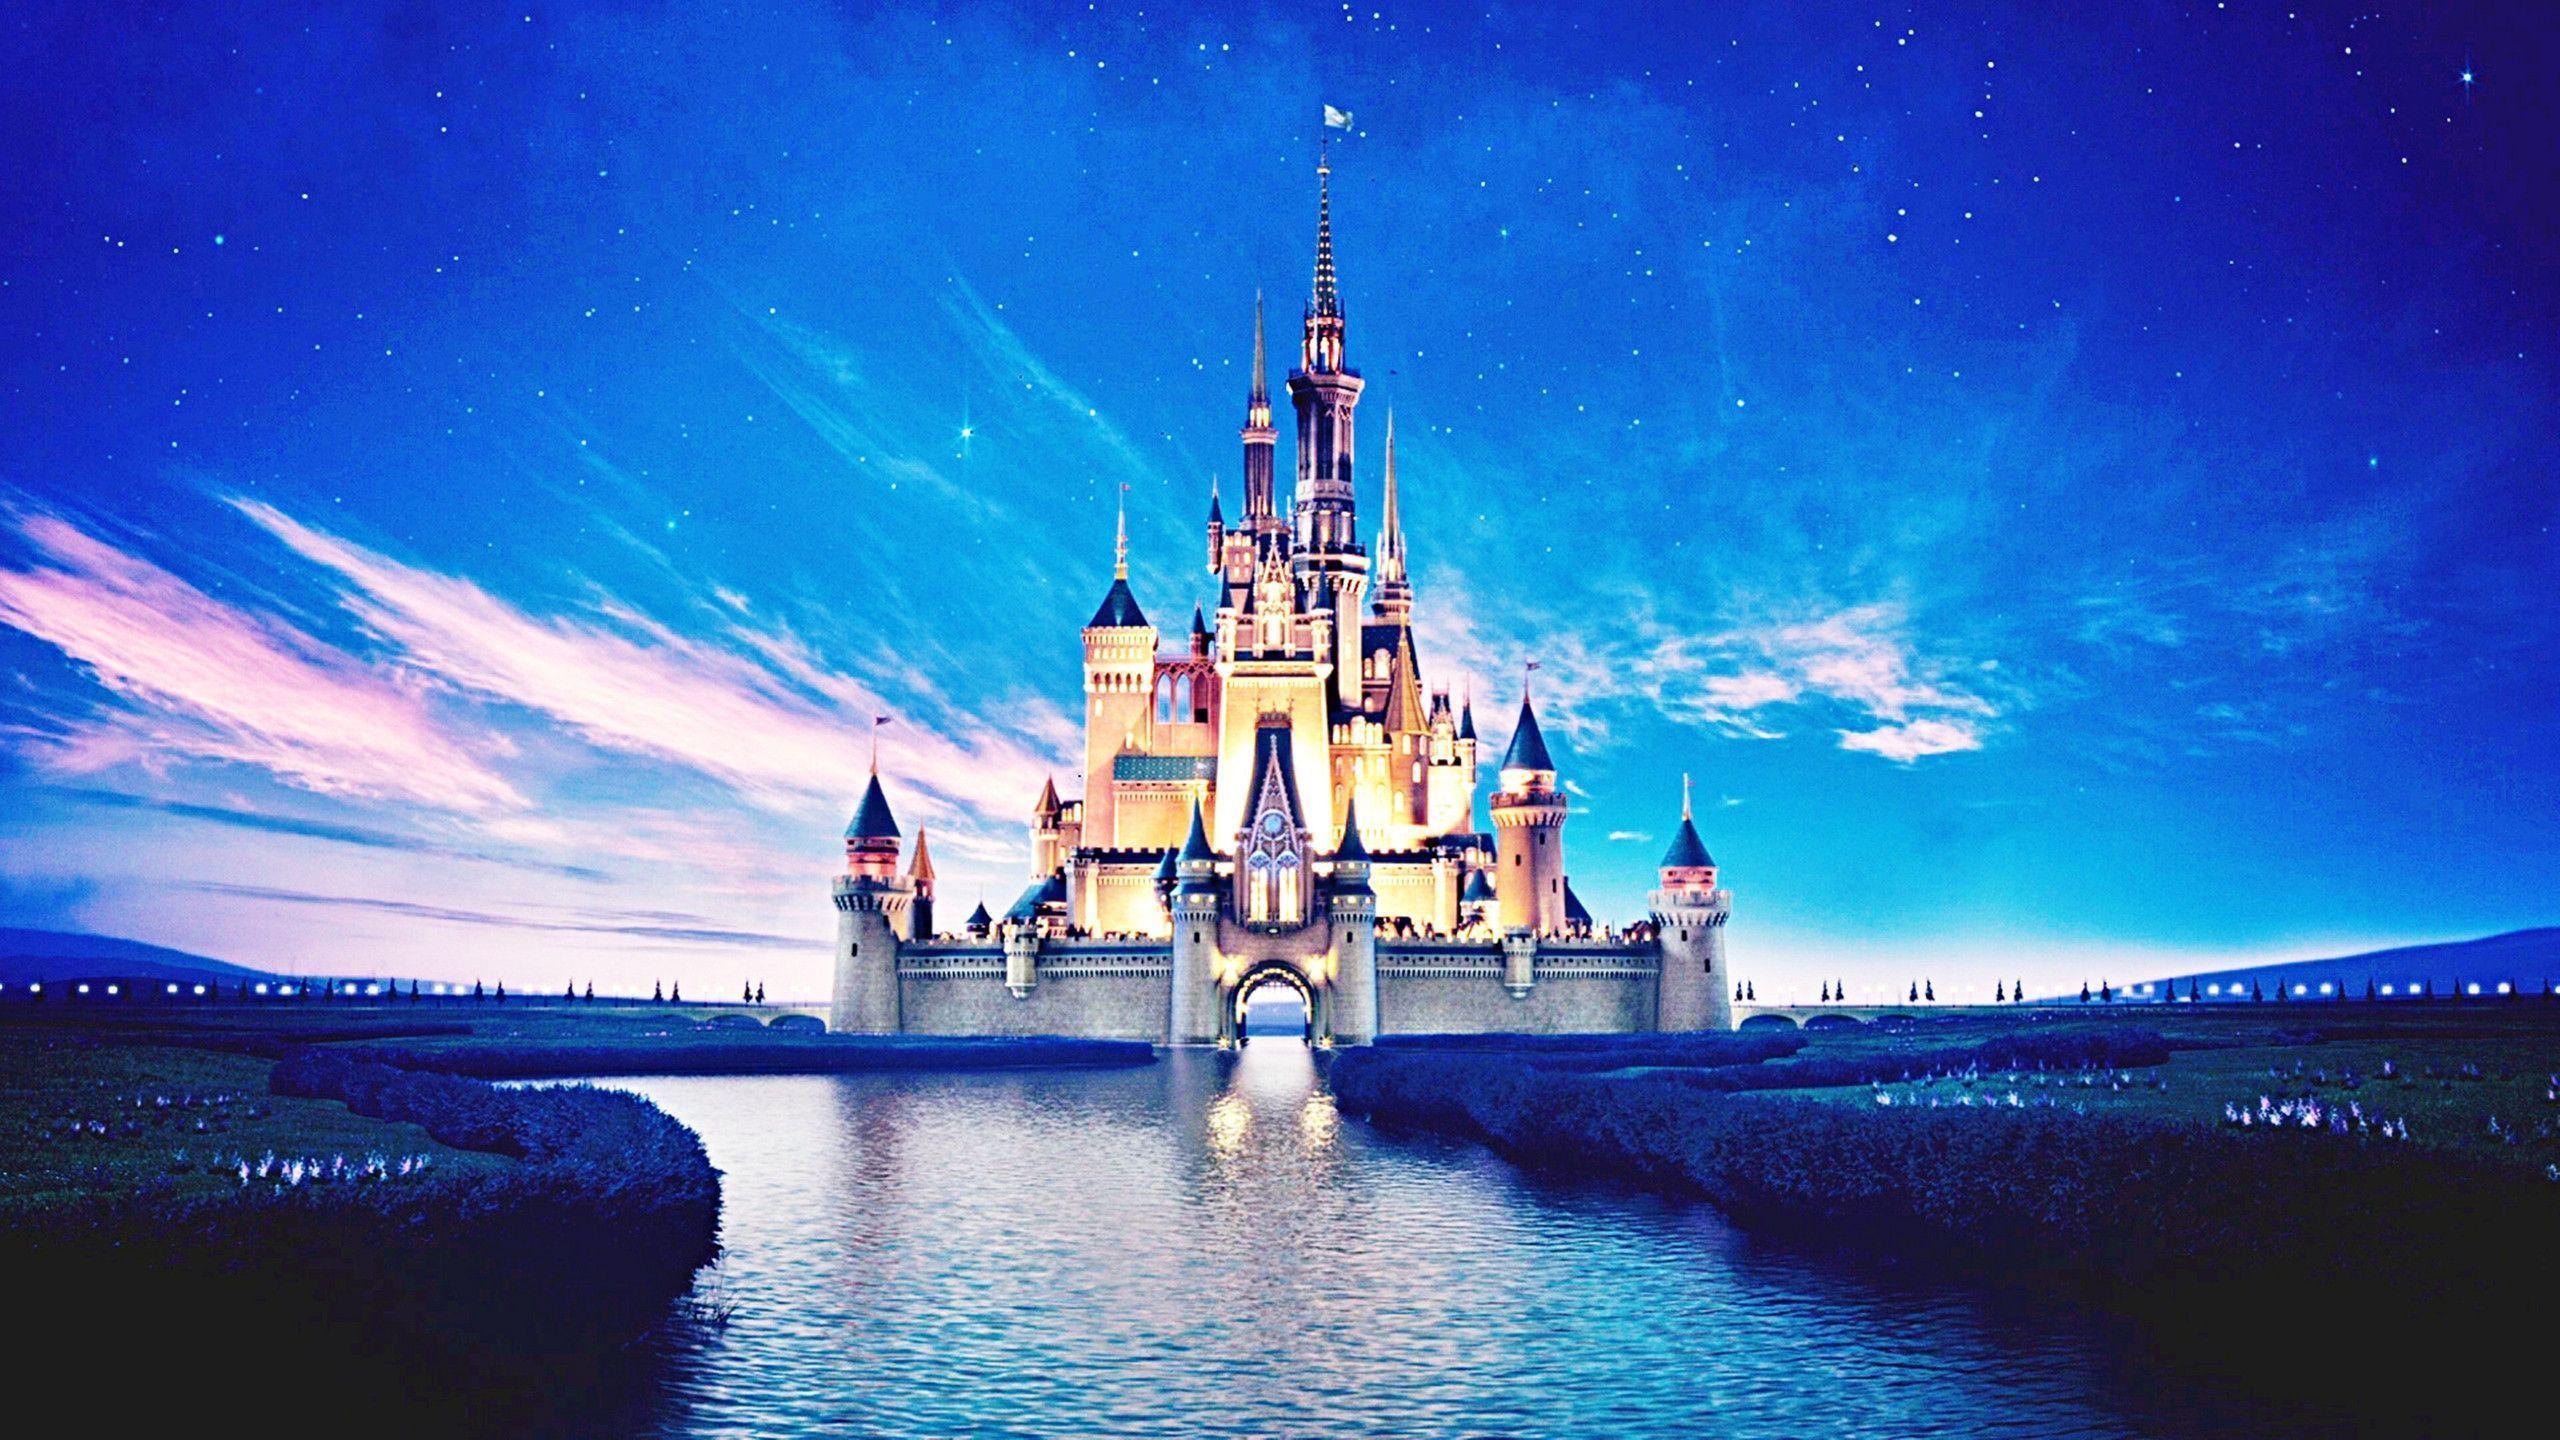 Disney World Wallpapers - Top Free